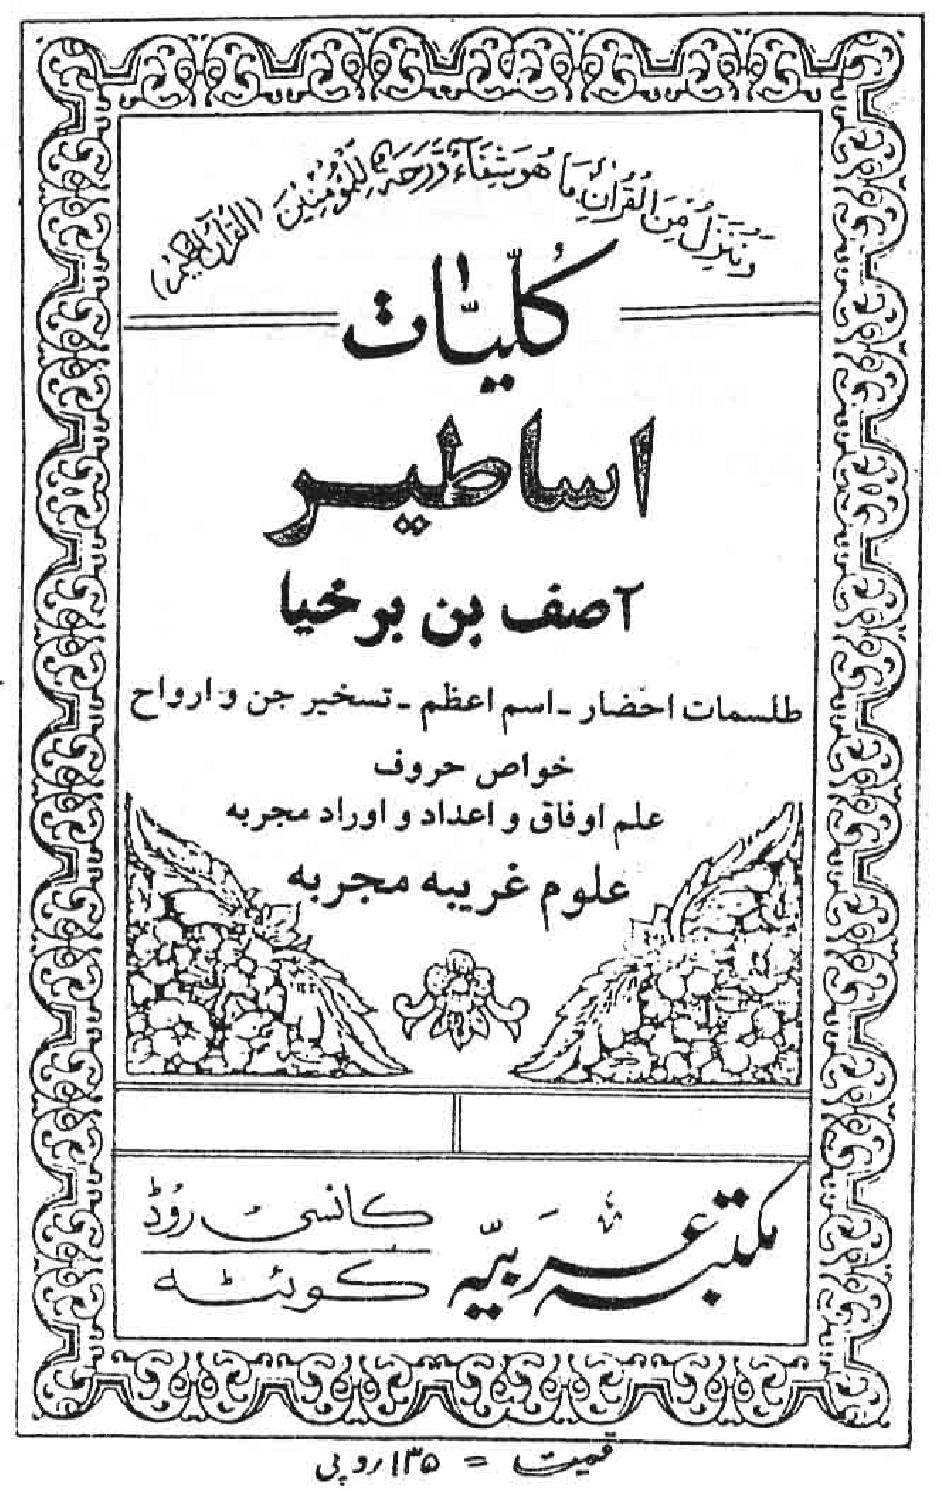 Kulyaat Asif Bin Barkhya Ebooks Free Books Free Ebooks Pdf Pdf Books Download